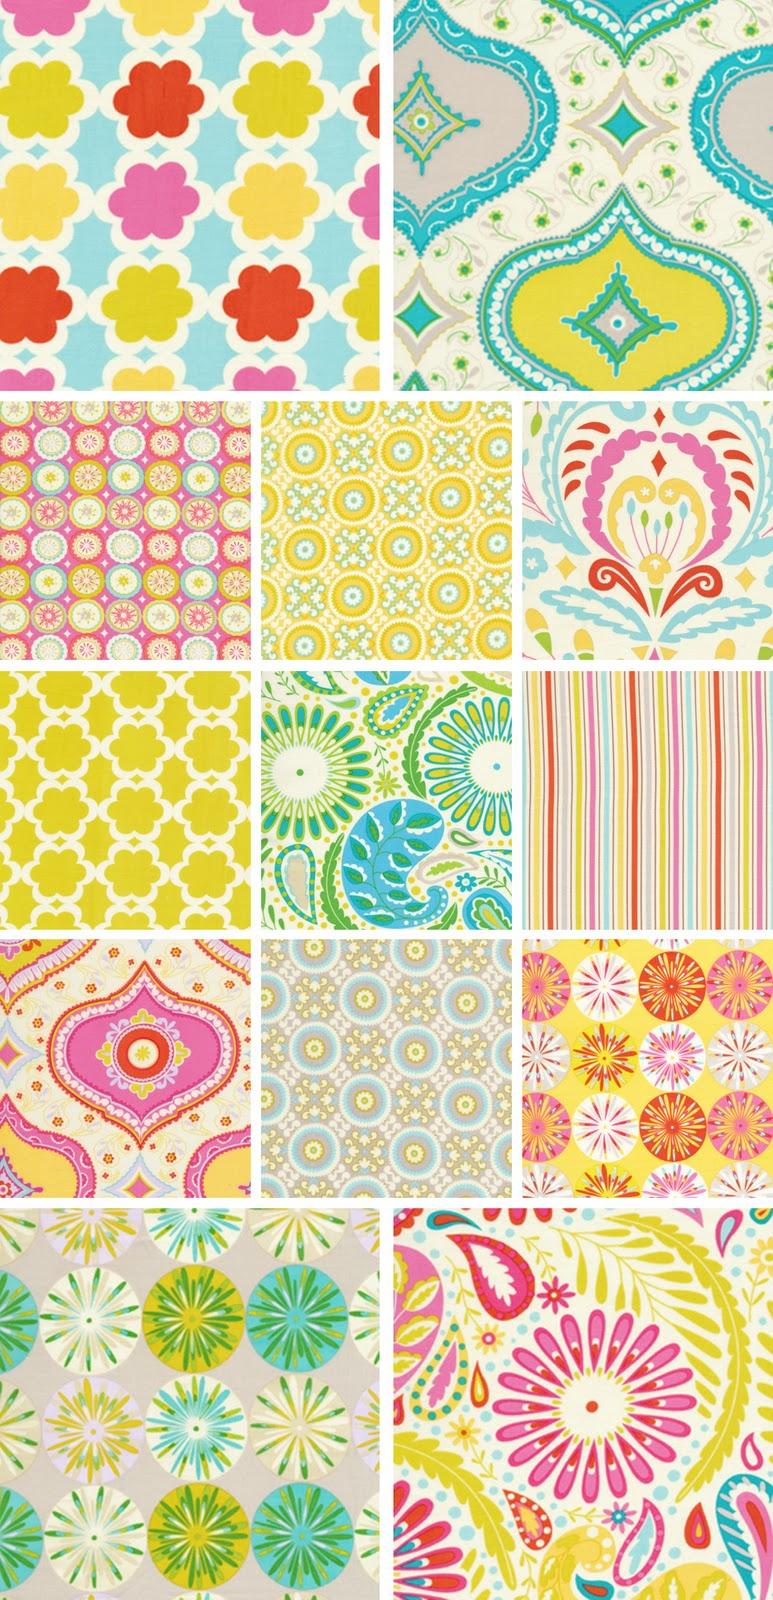 Fancy tiger crafts dena designs kumari gardens fabrics for Dena designs fabric kumari garden